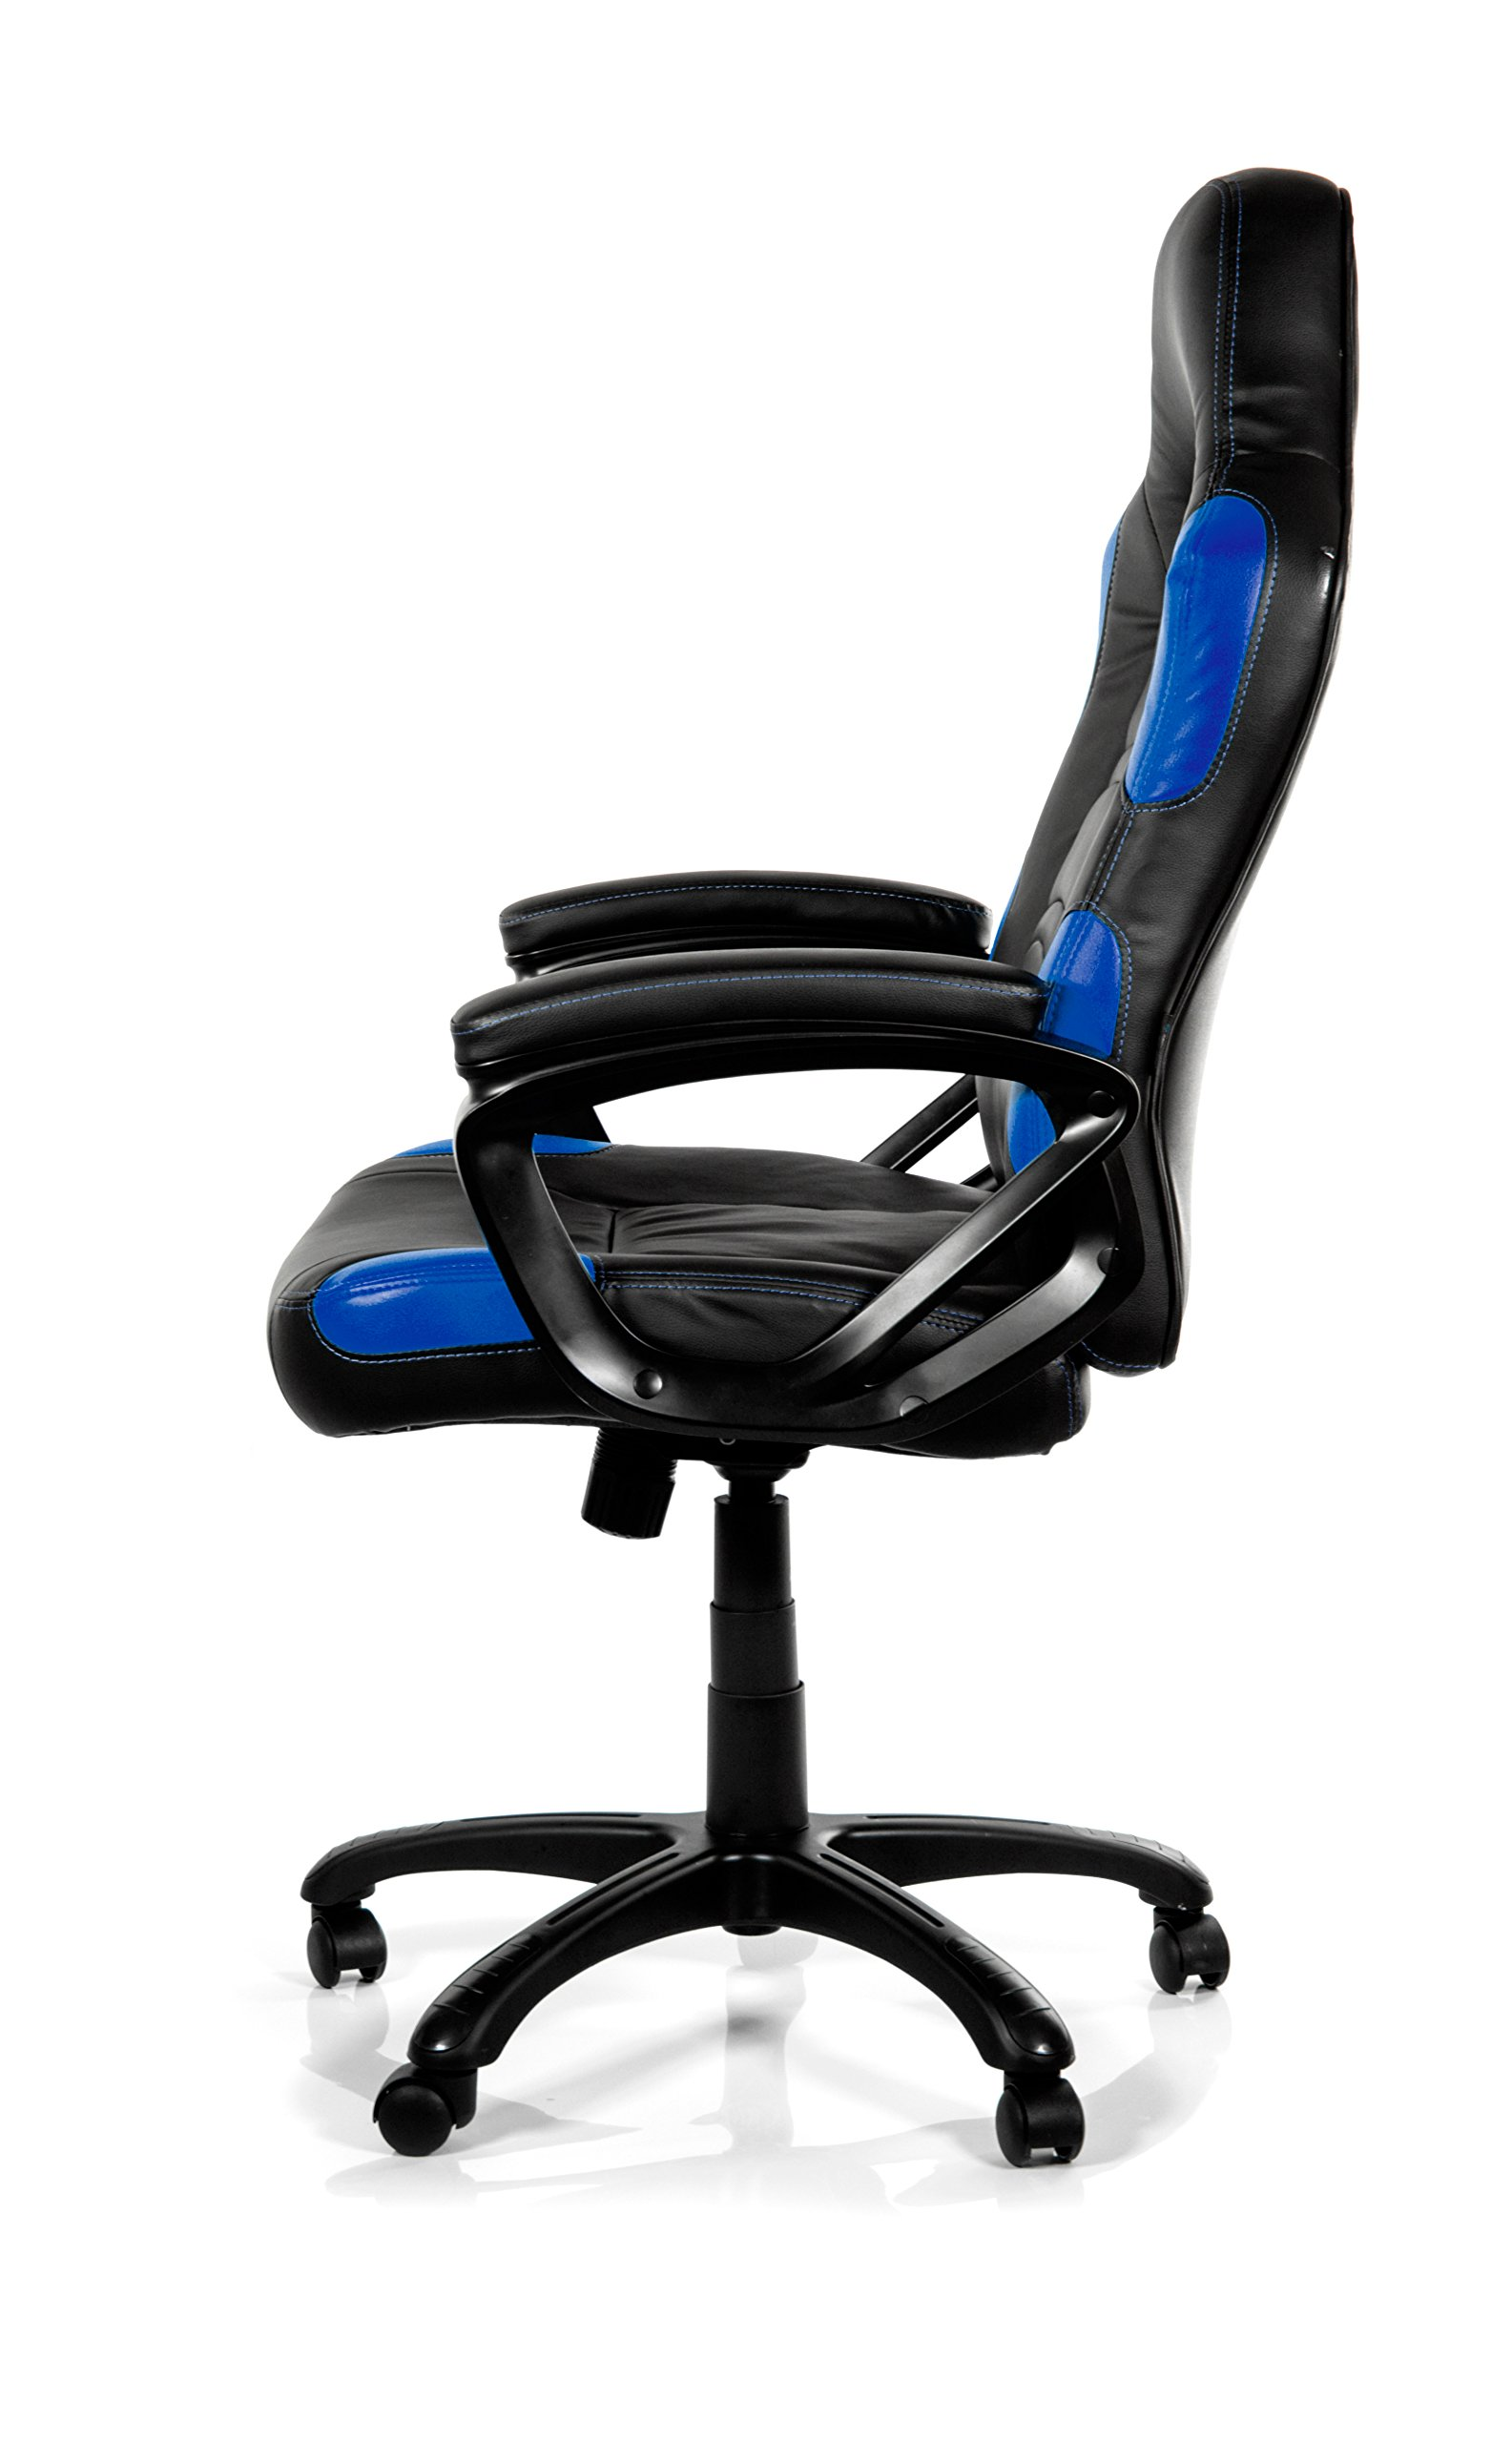 Silla Arozzi Enzo Blue Negro, 150 kg, 125 cm, 115 cm, 53 cm, 51 cm